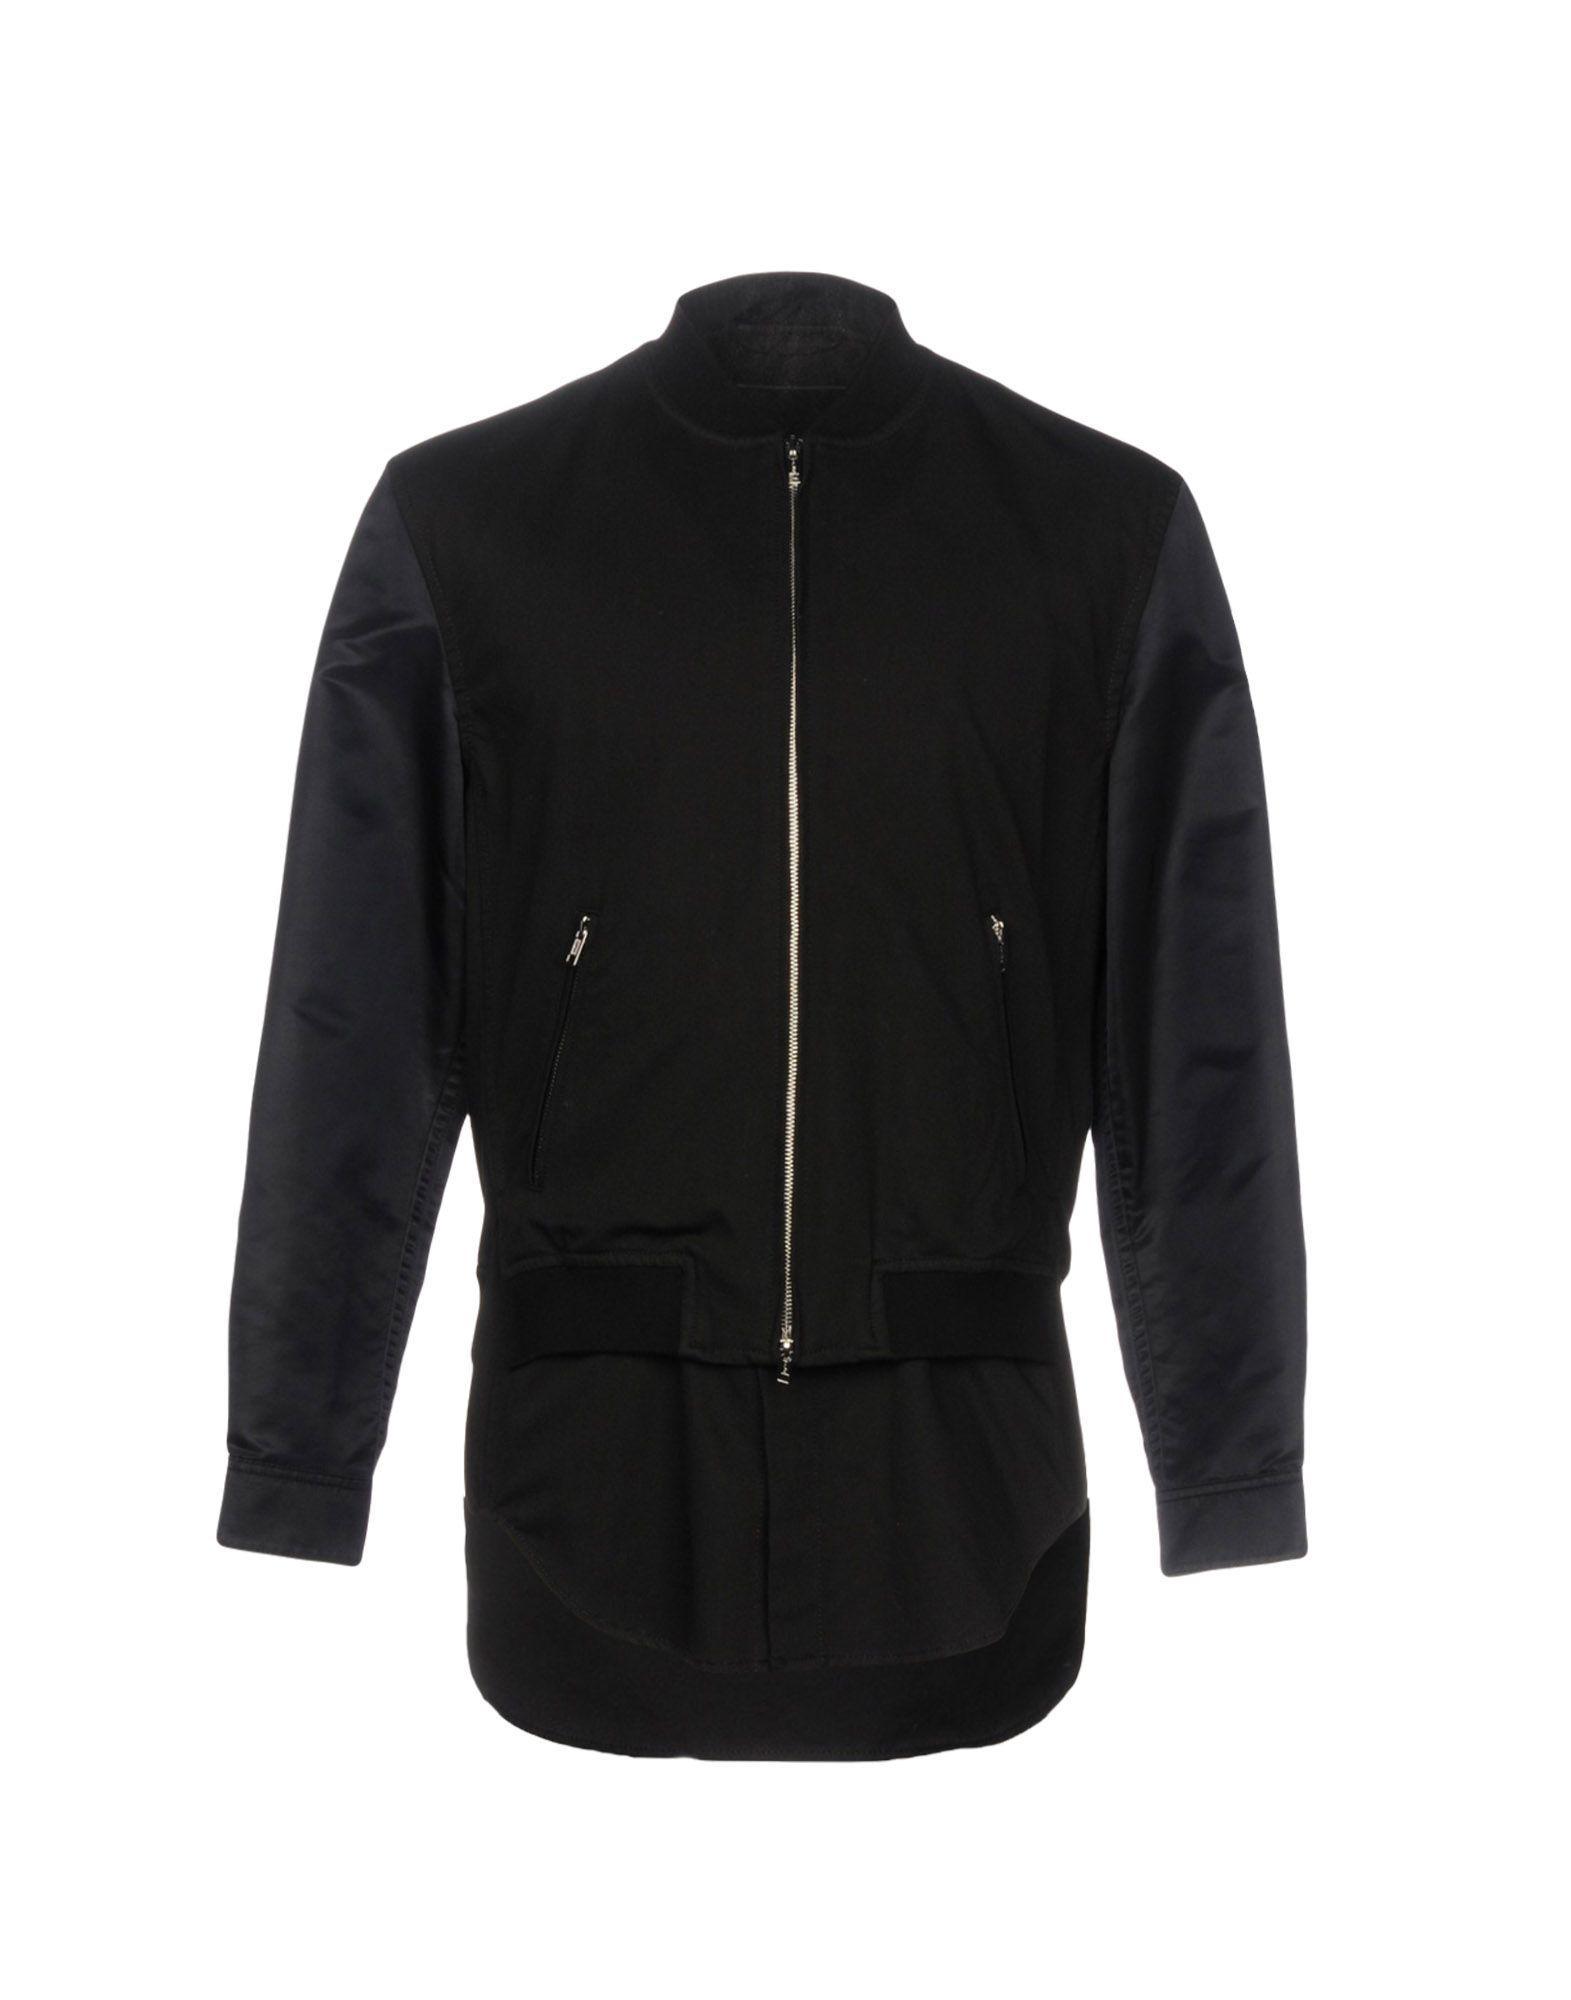 3.1 Phillip Lim Jacket In Black